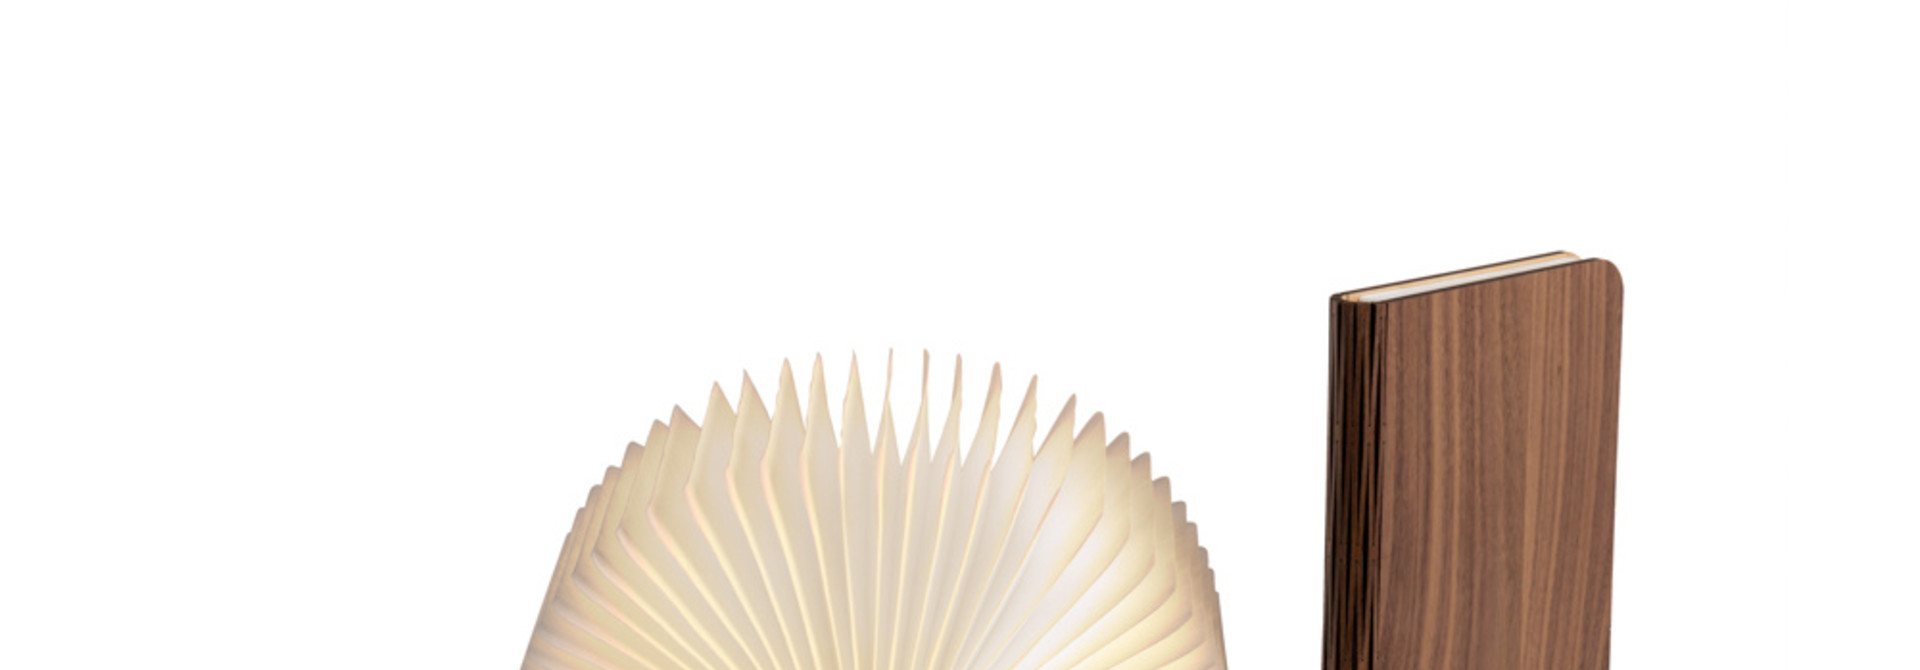 Boek Lamp Walnoot Bruin M